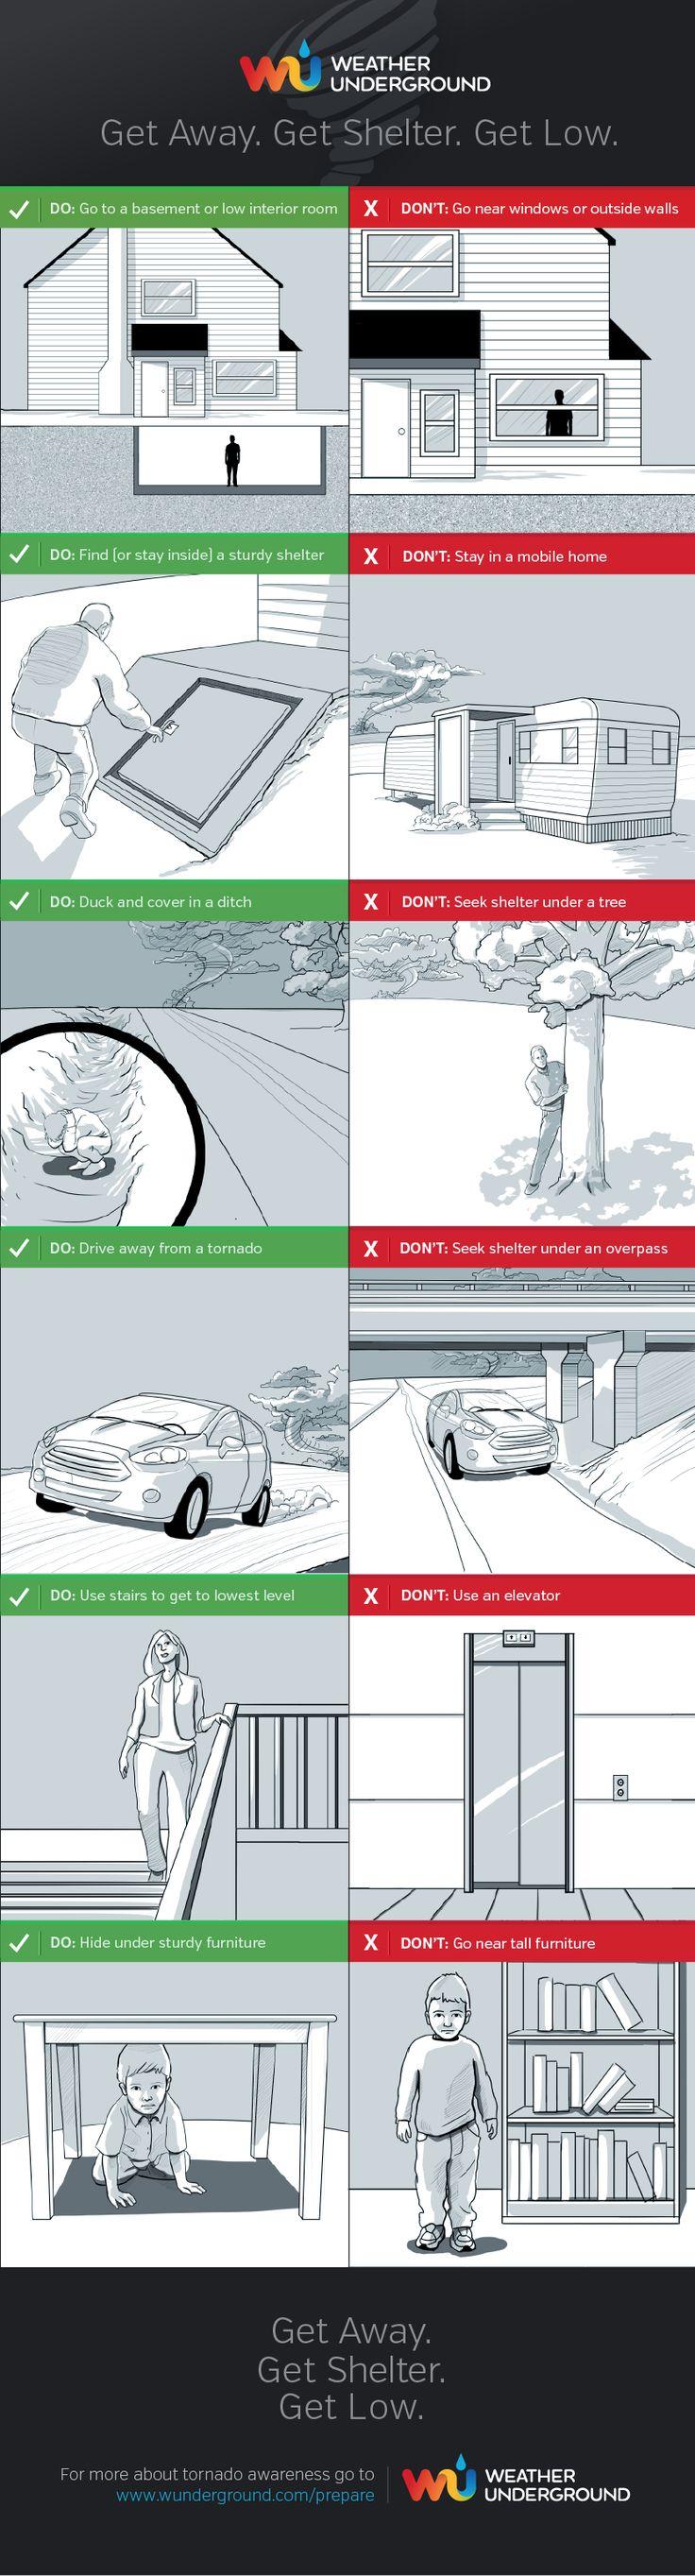 Tornado Safety click here: http://ift.tt/2jpALso